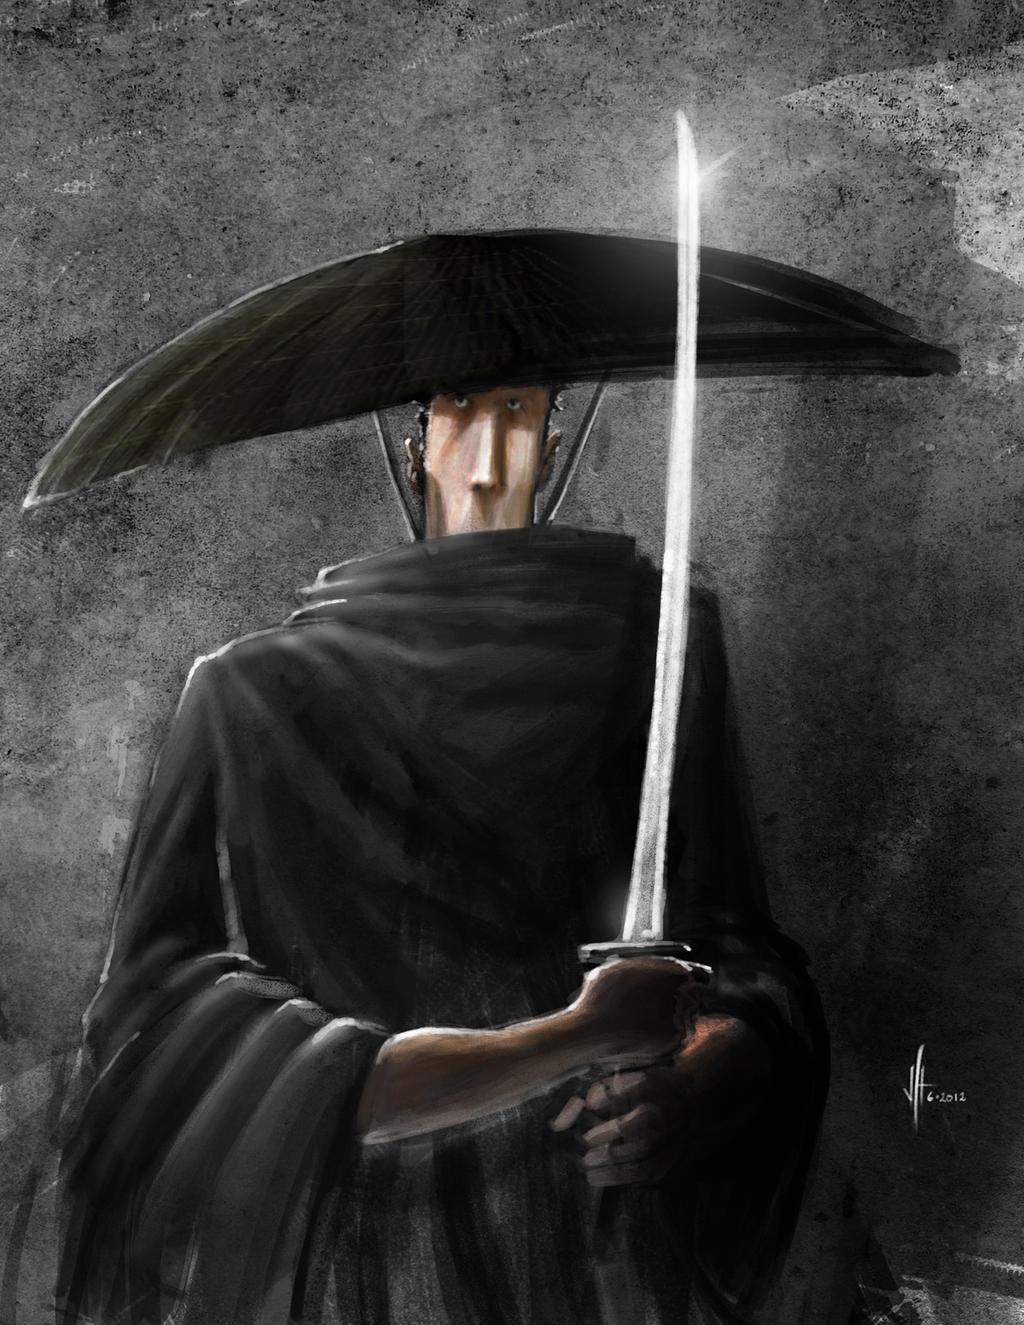 Long Face Samurai by feeesh